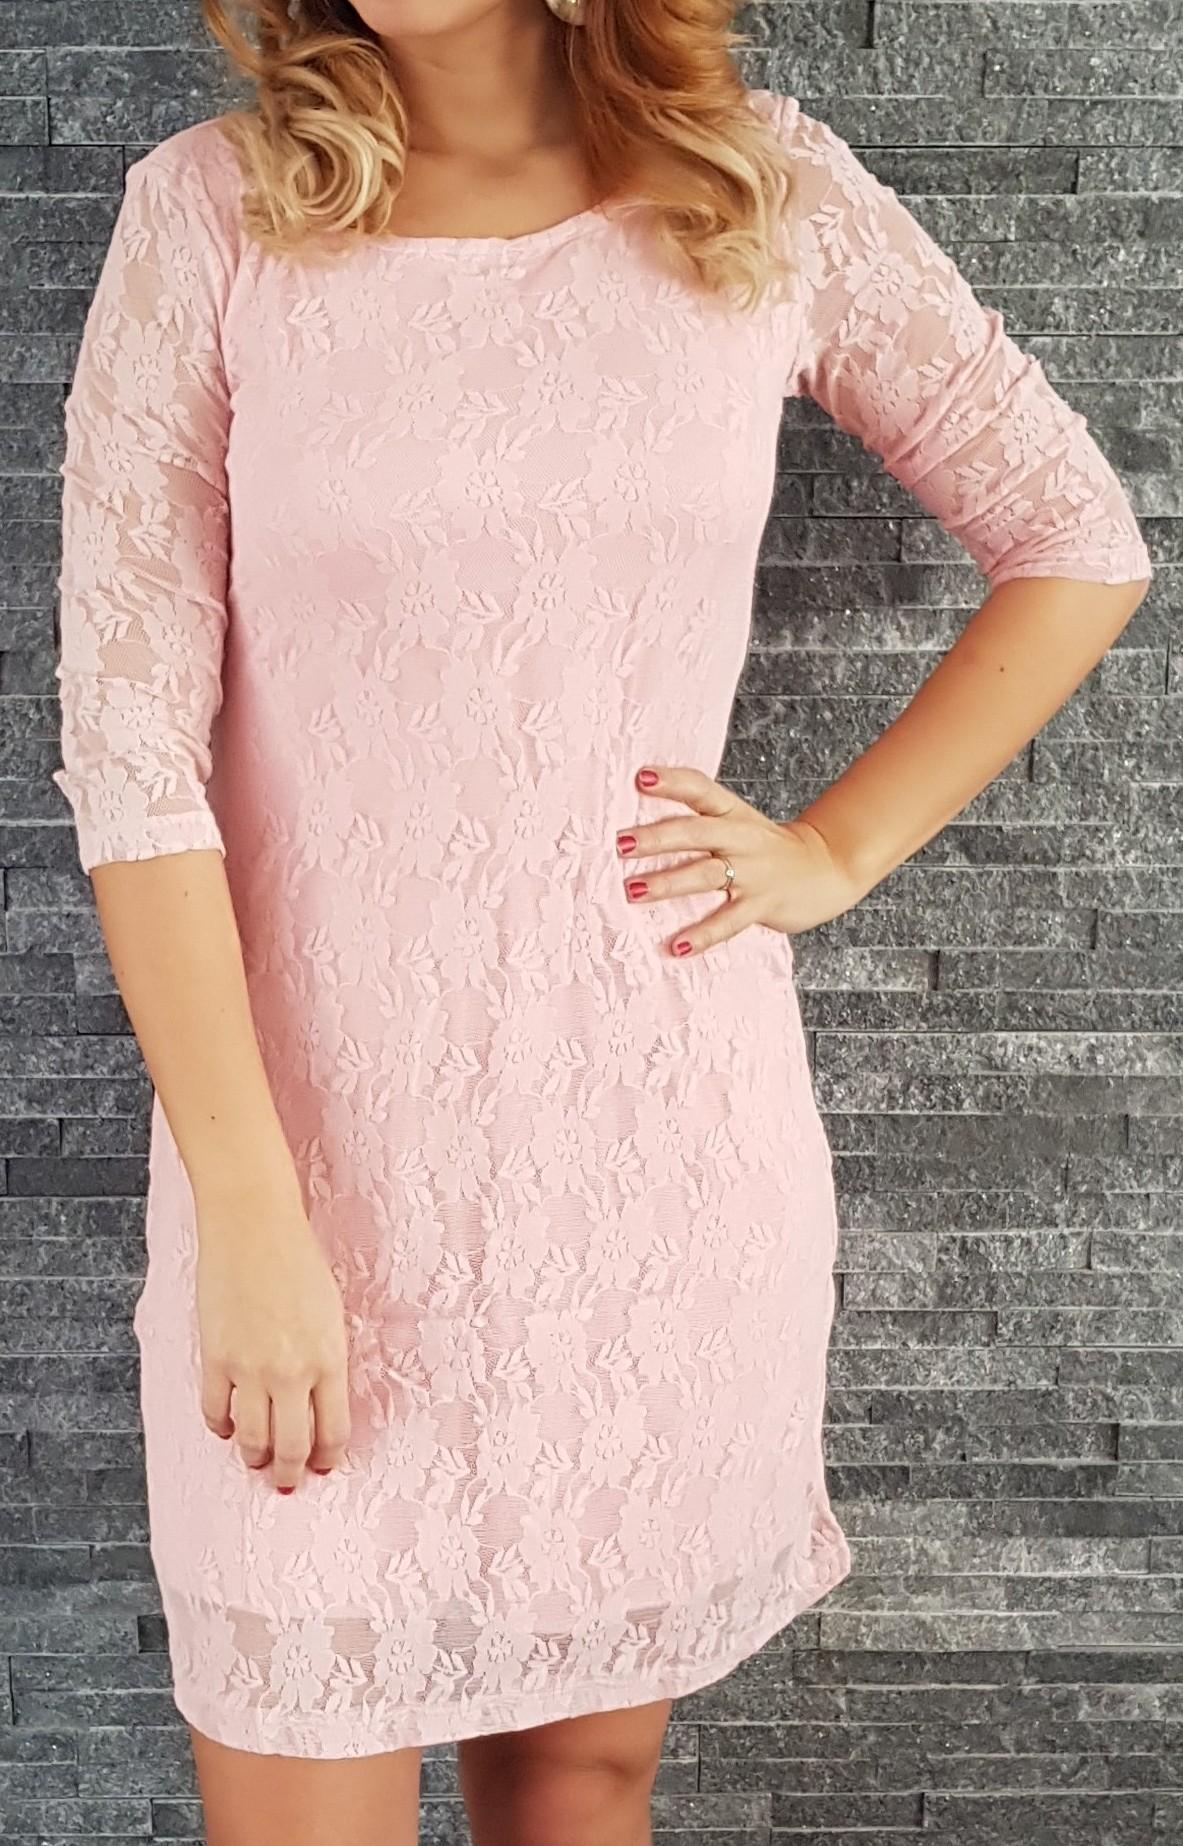 50a7c70c7f77 Čipkované šaty Klasika ružové